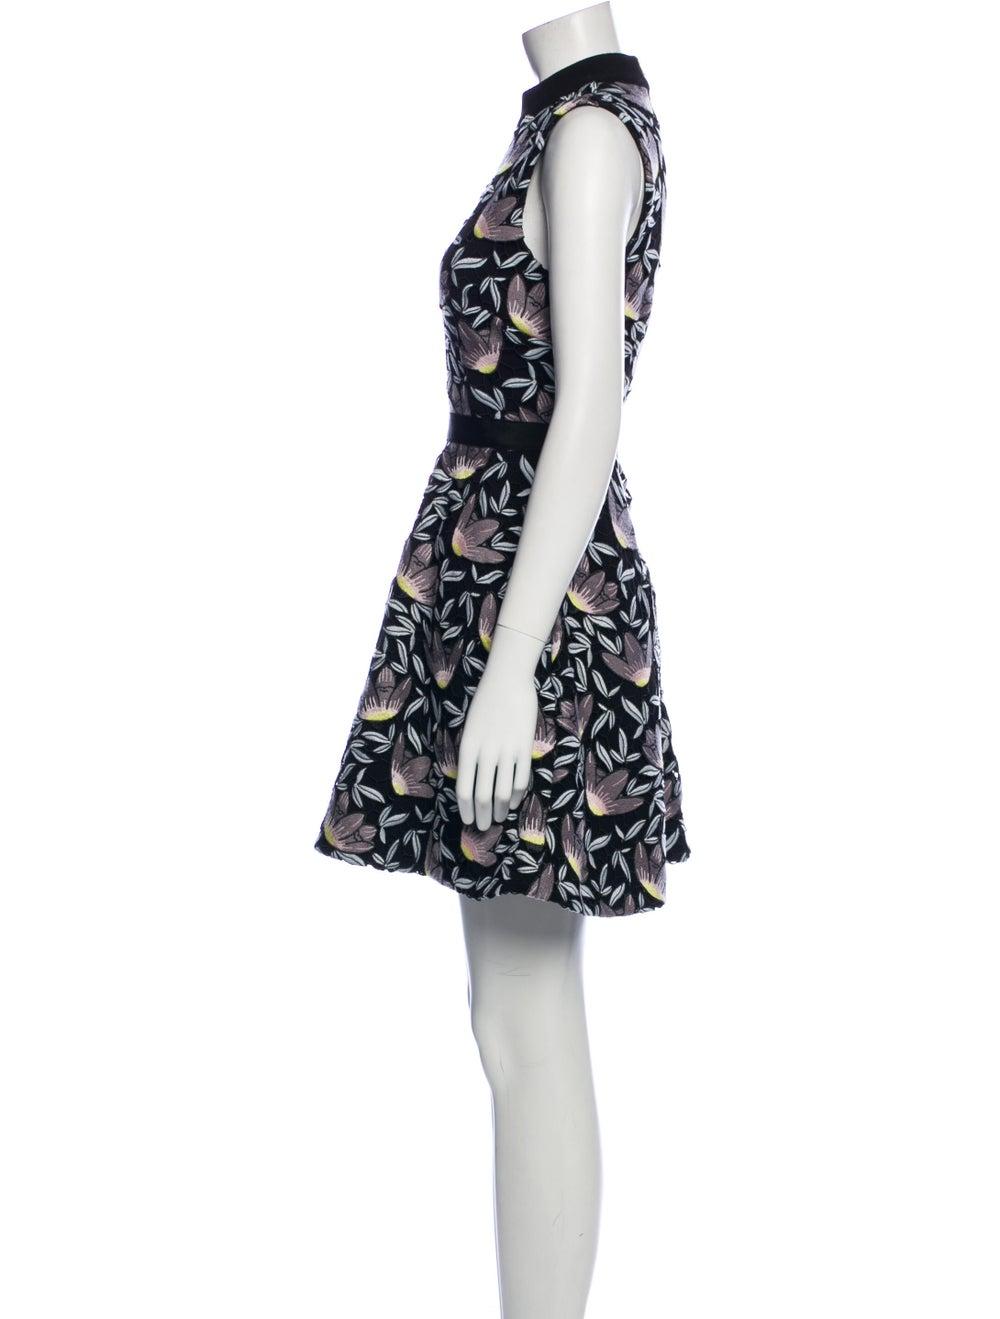 Self-Portrait Printed Mini Dress Black - image 2